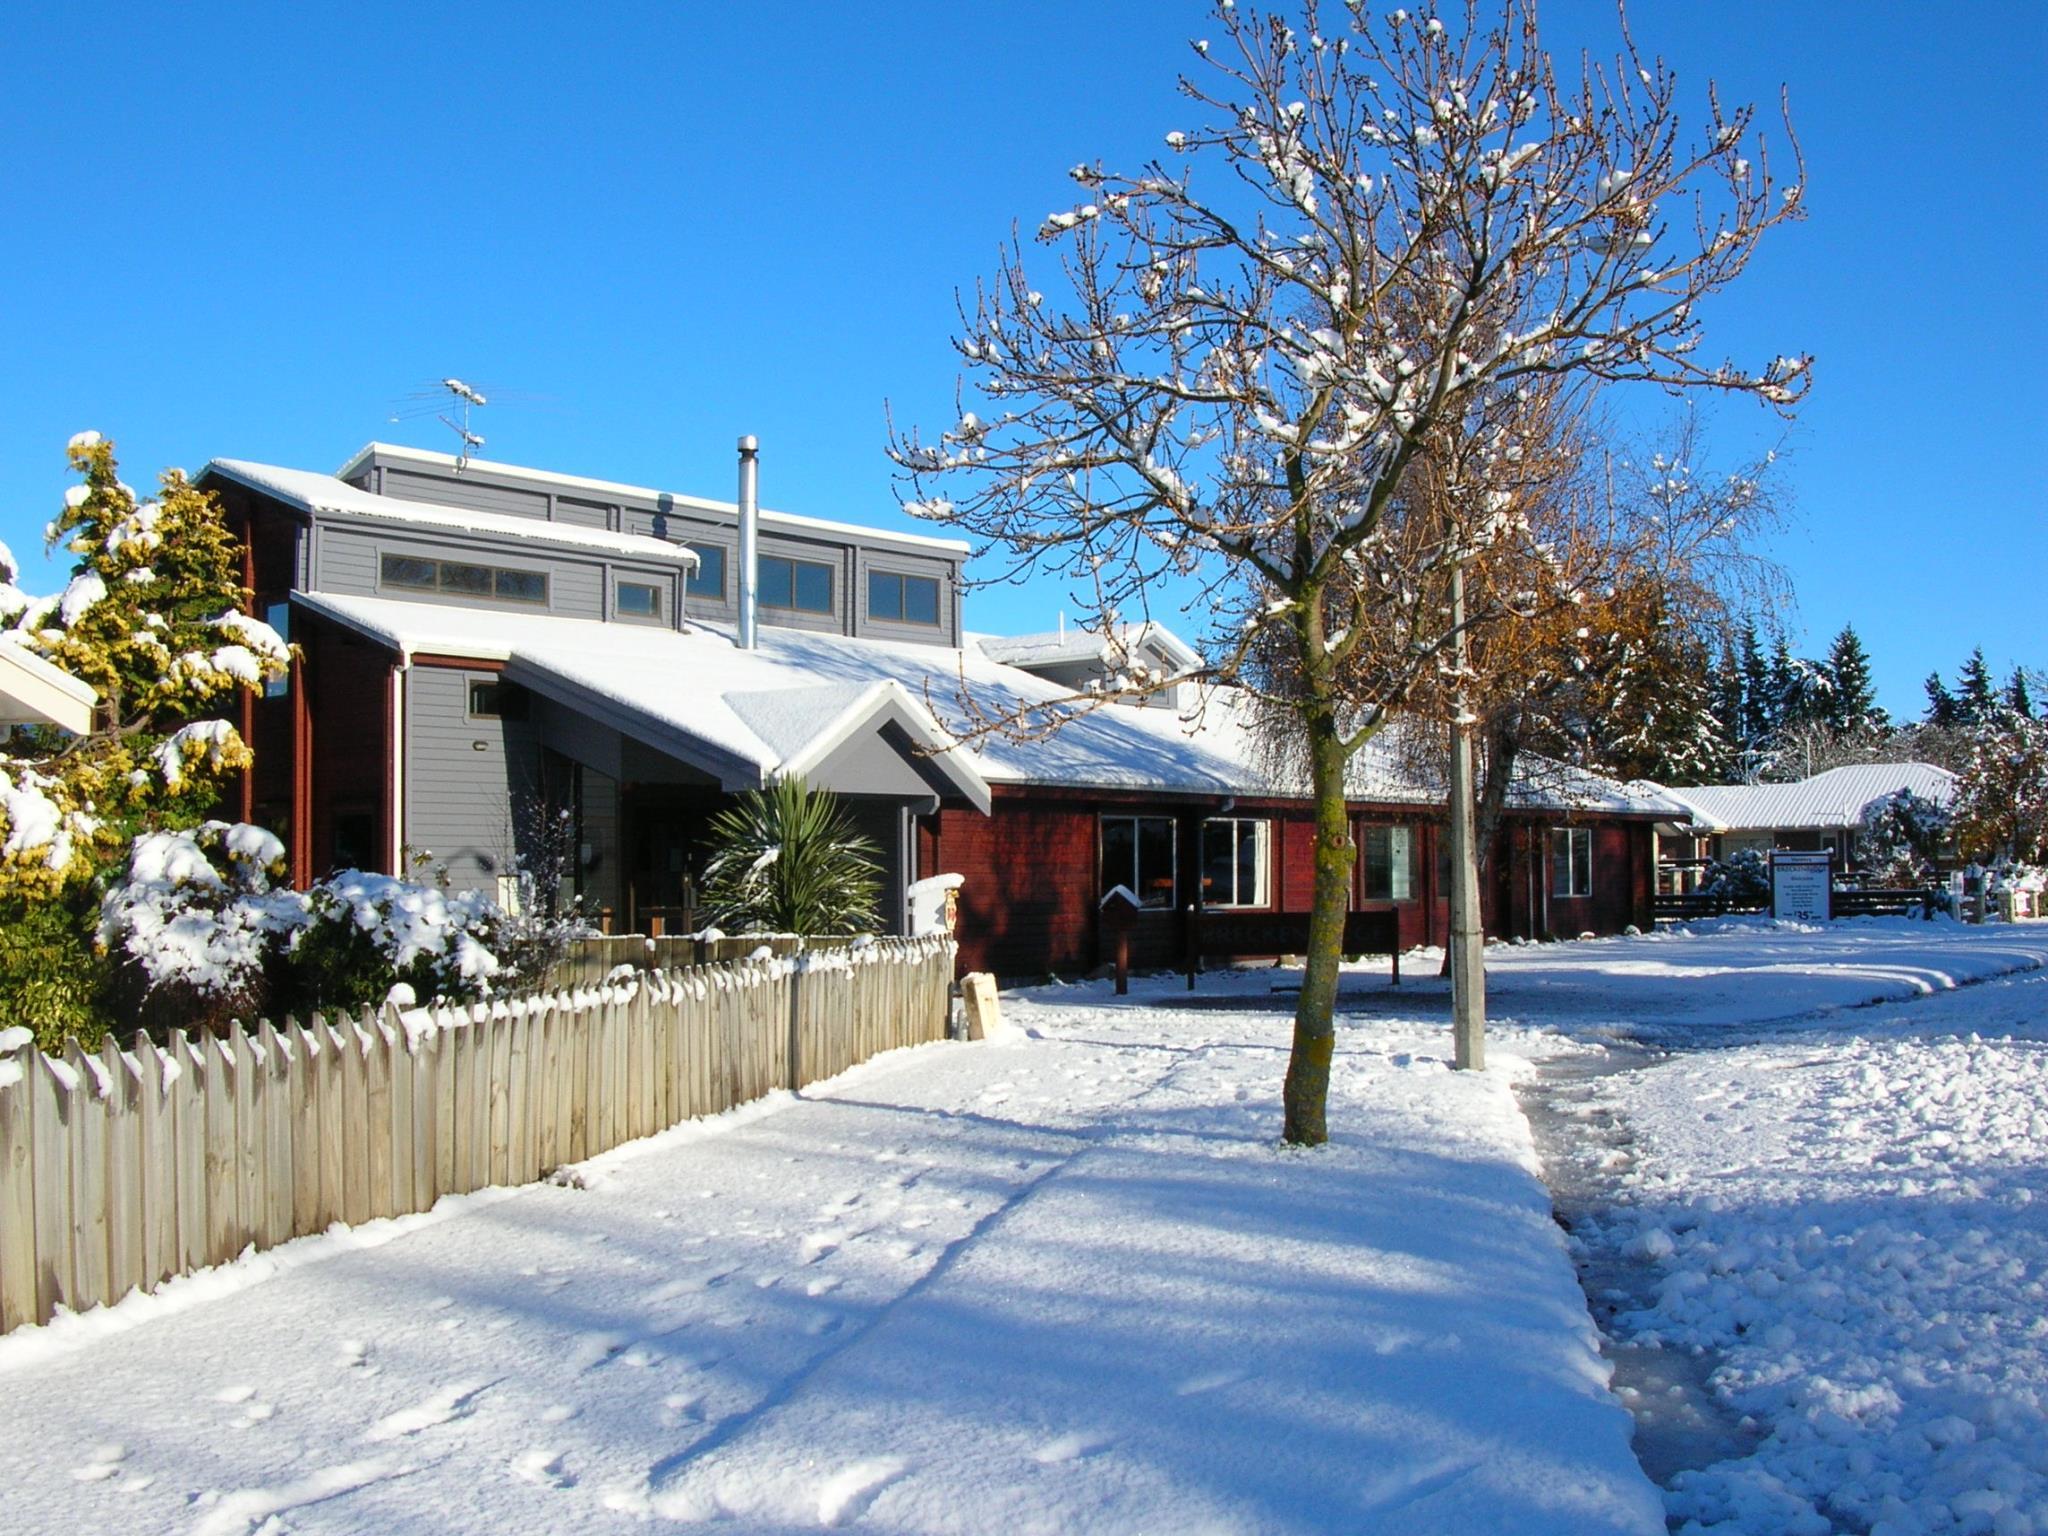 Breckenridge Lodge Methven